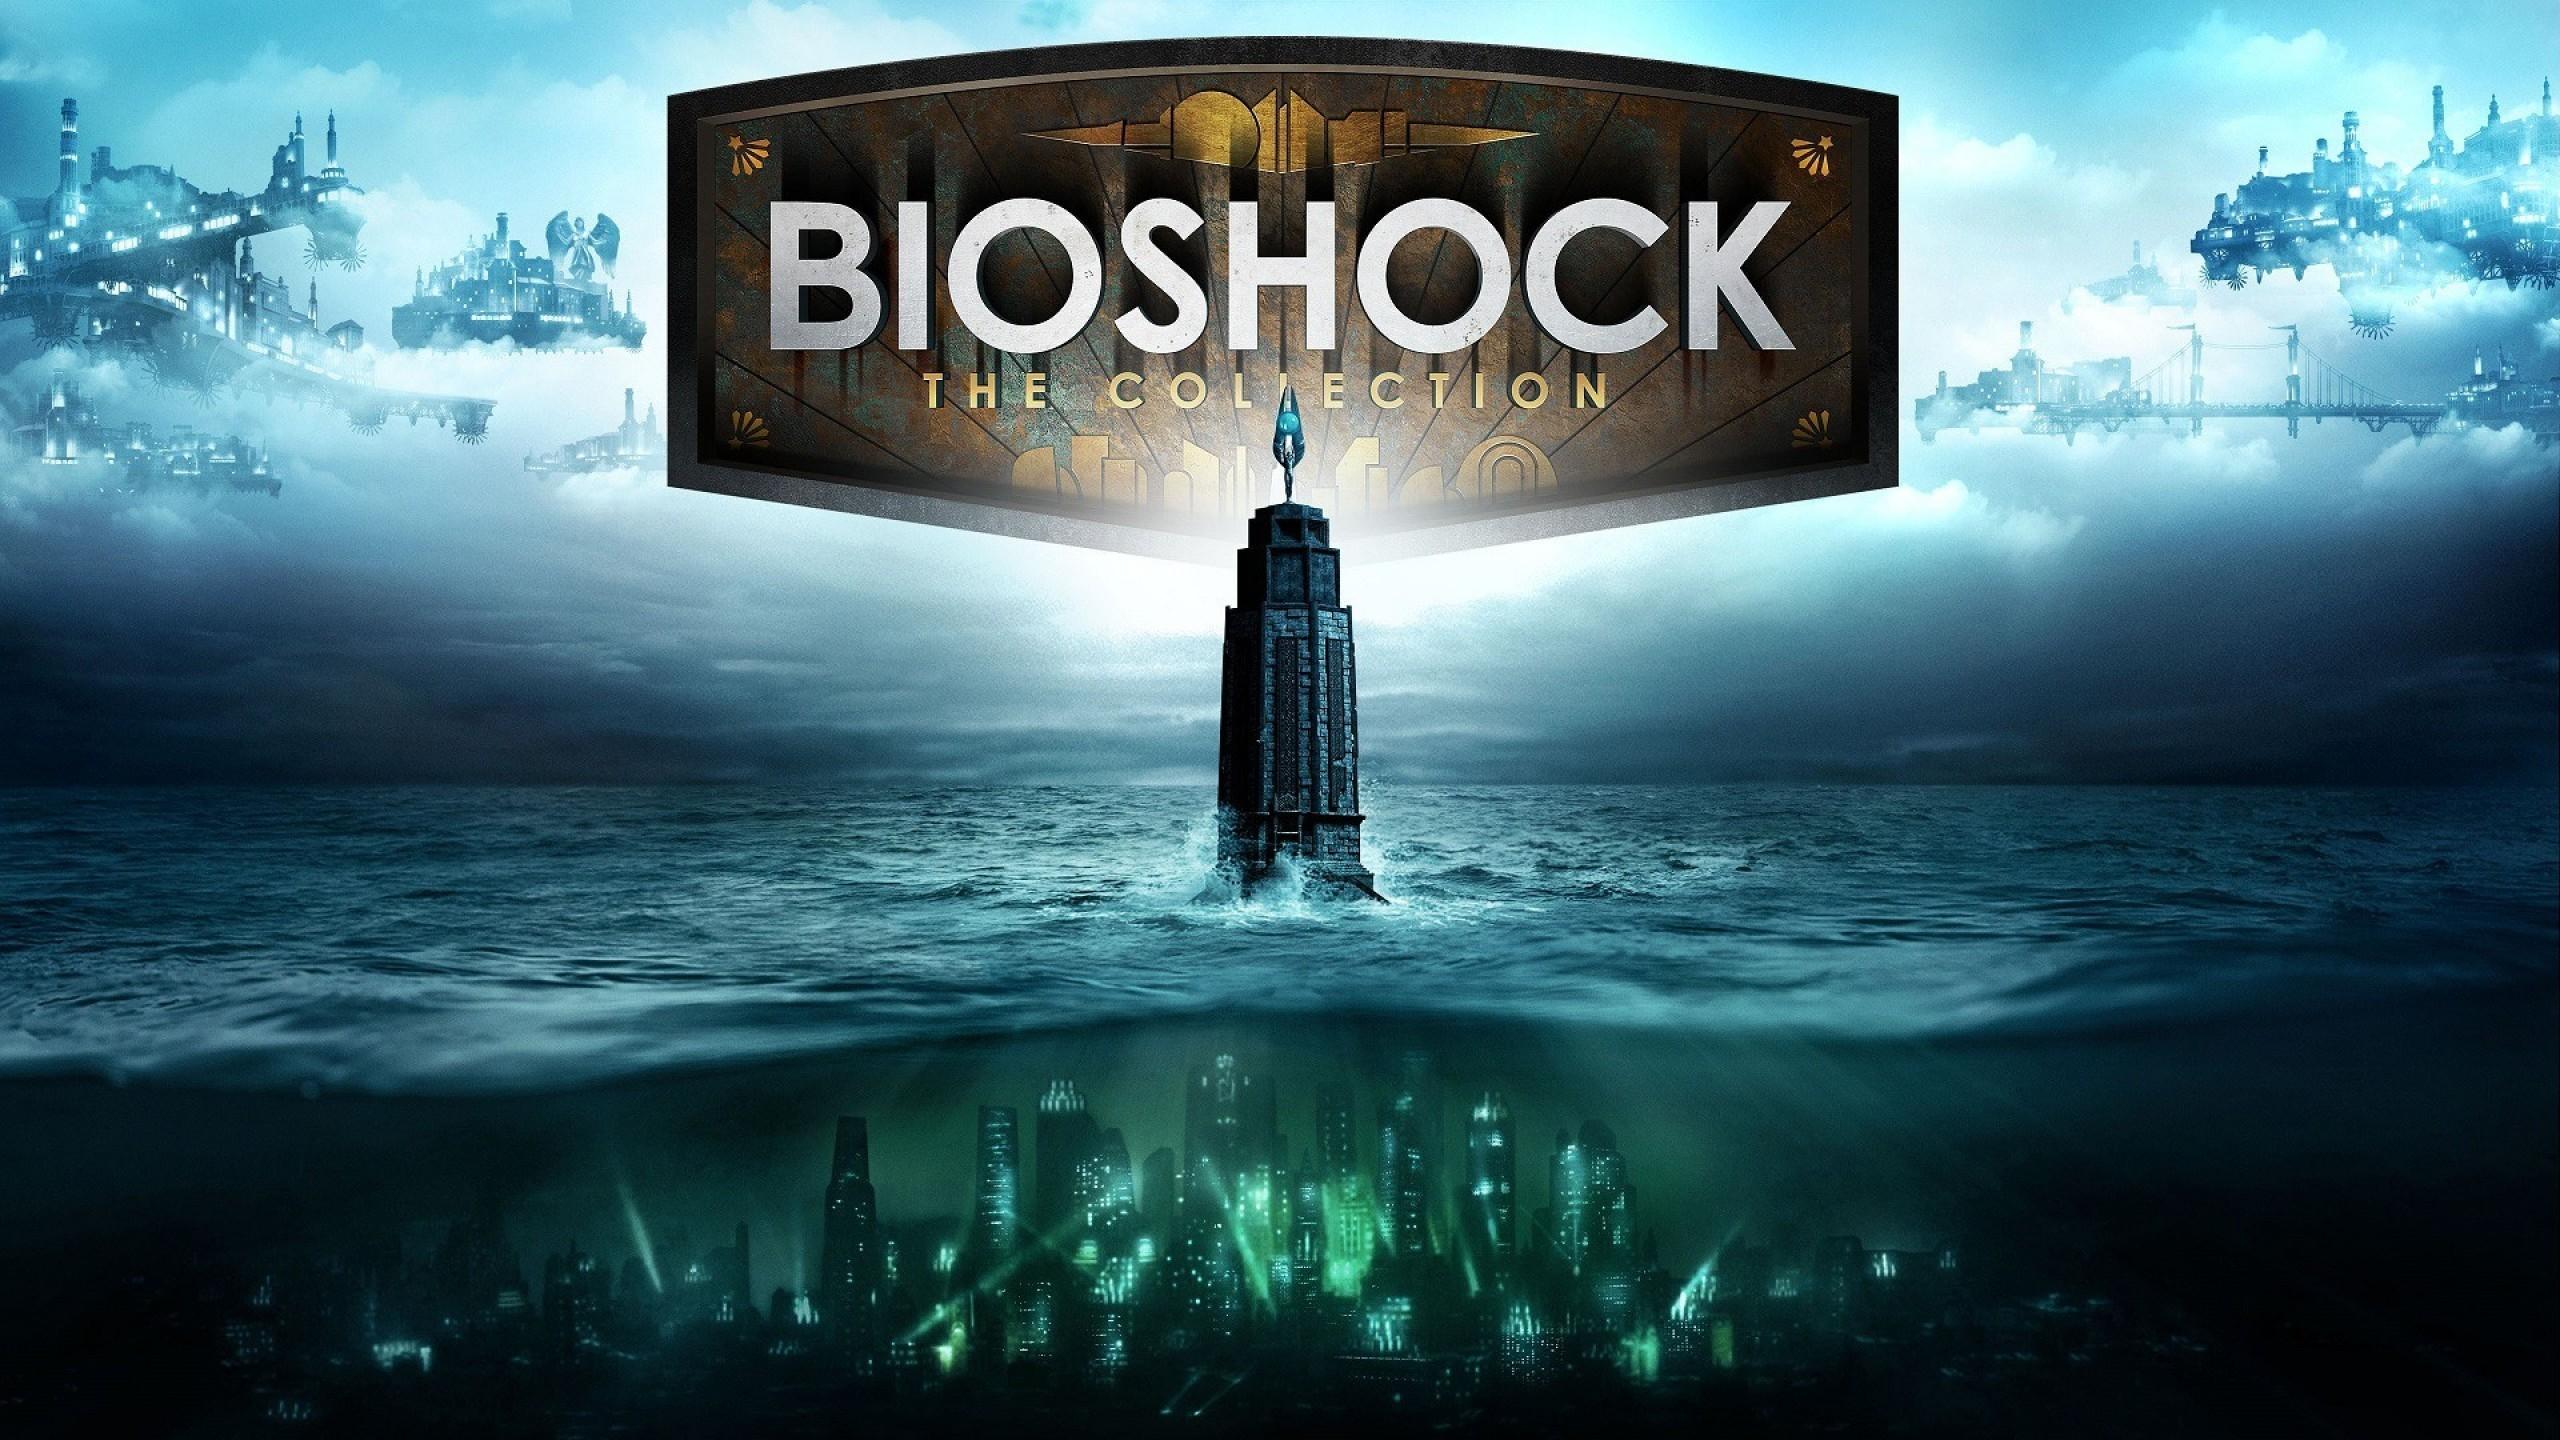 Bioshock, Rapture, Columbia, Underworld